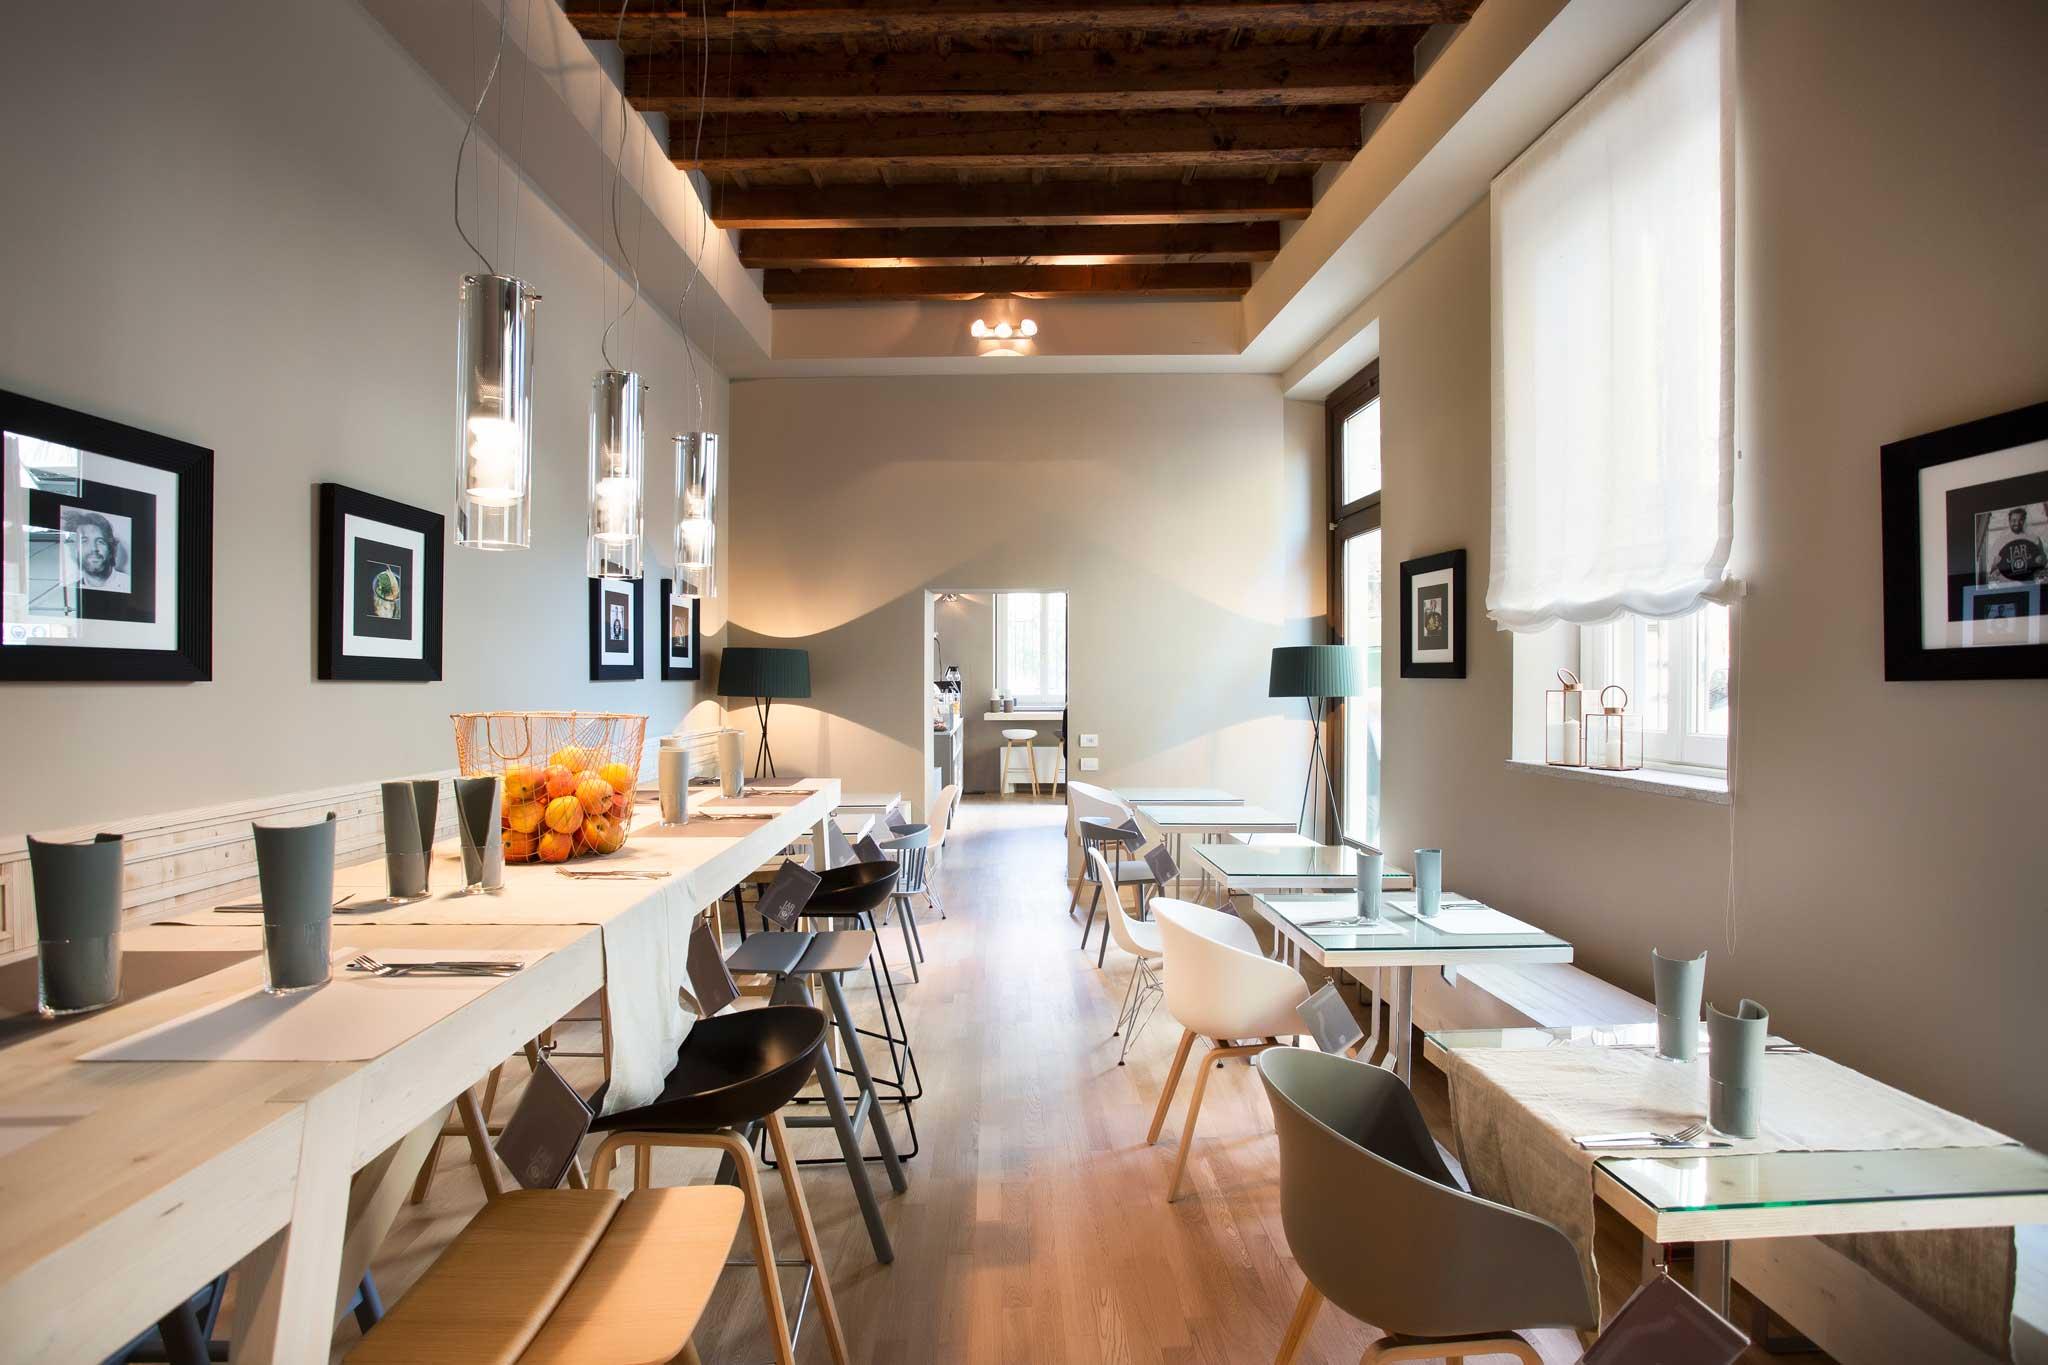 Jarit ristorante Milano